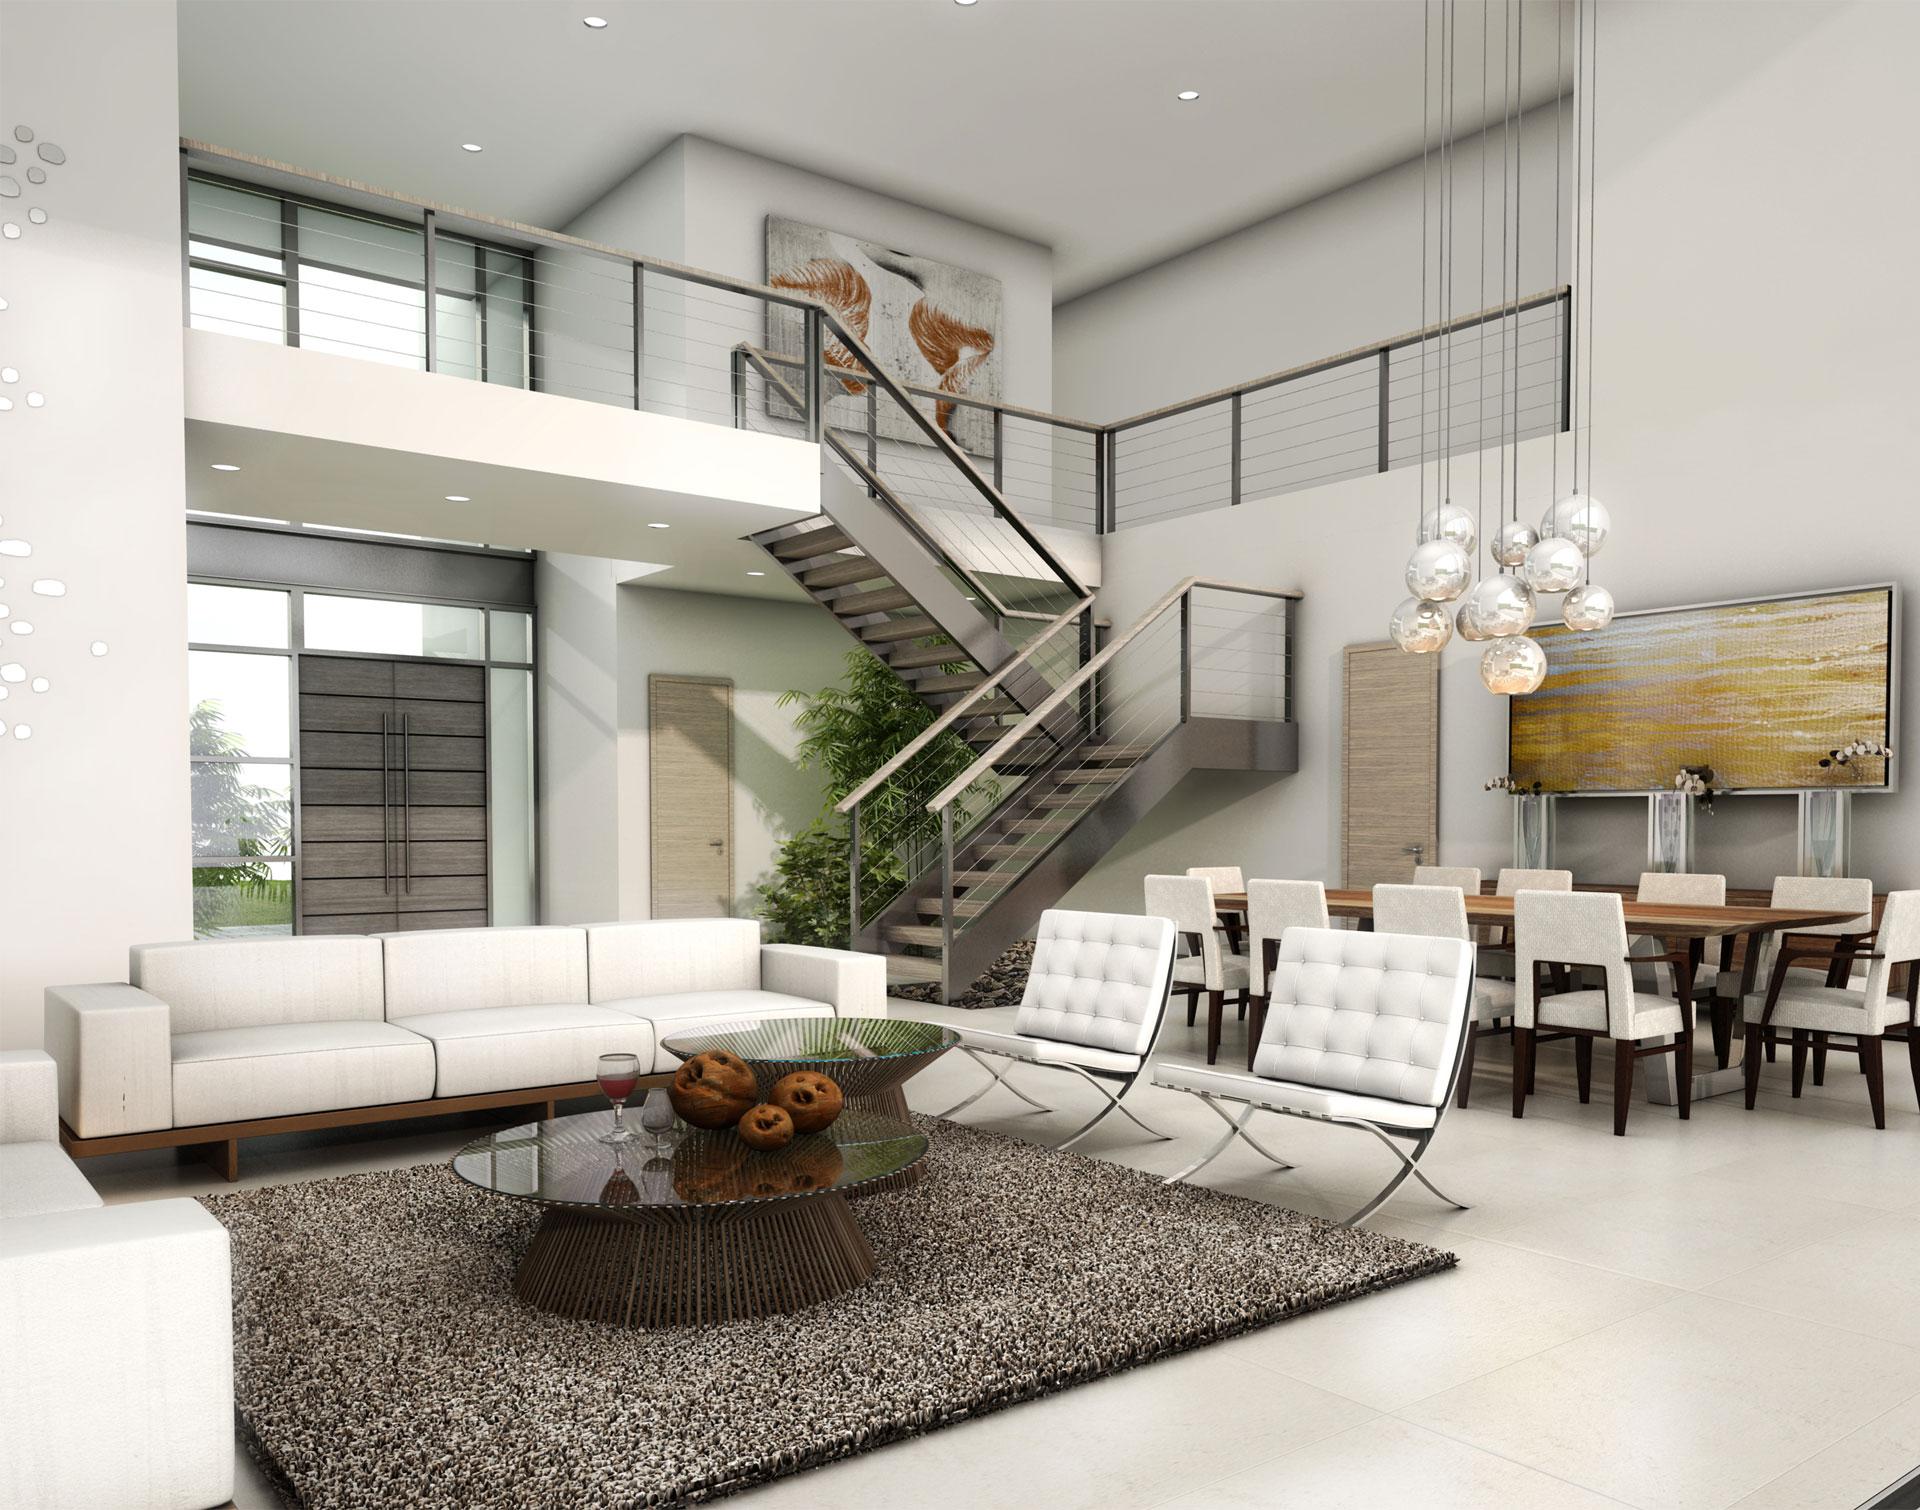 Interior Design living room project in 1350 Bay Harbor, Florida